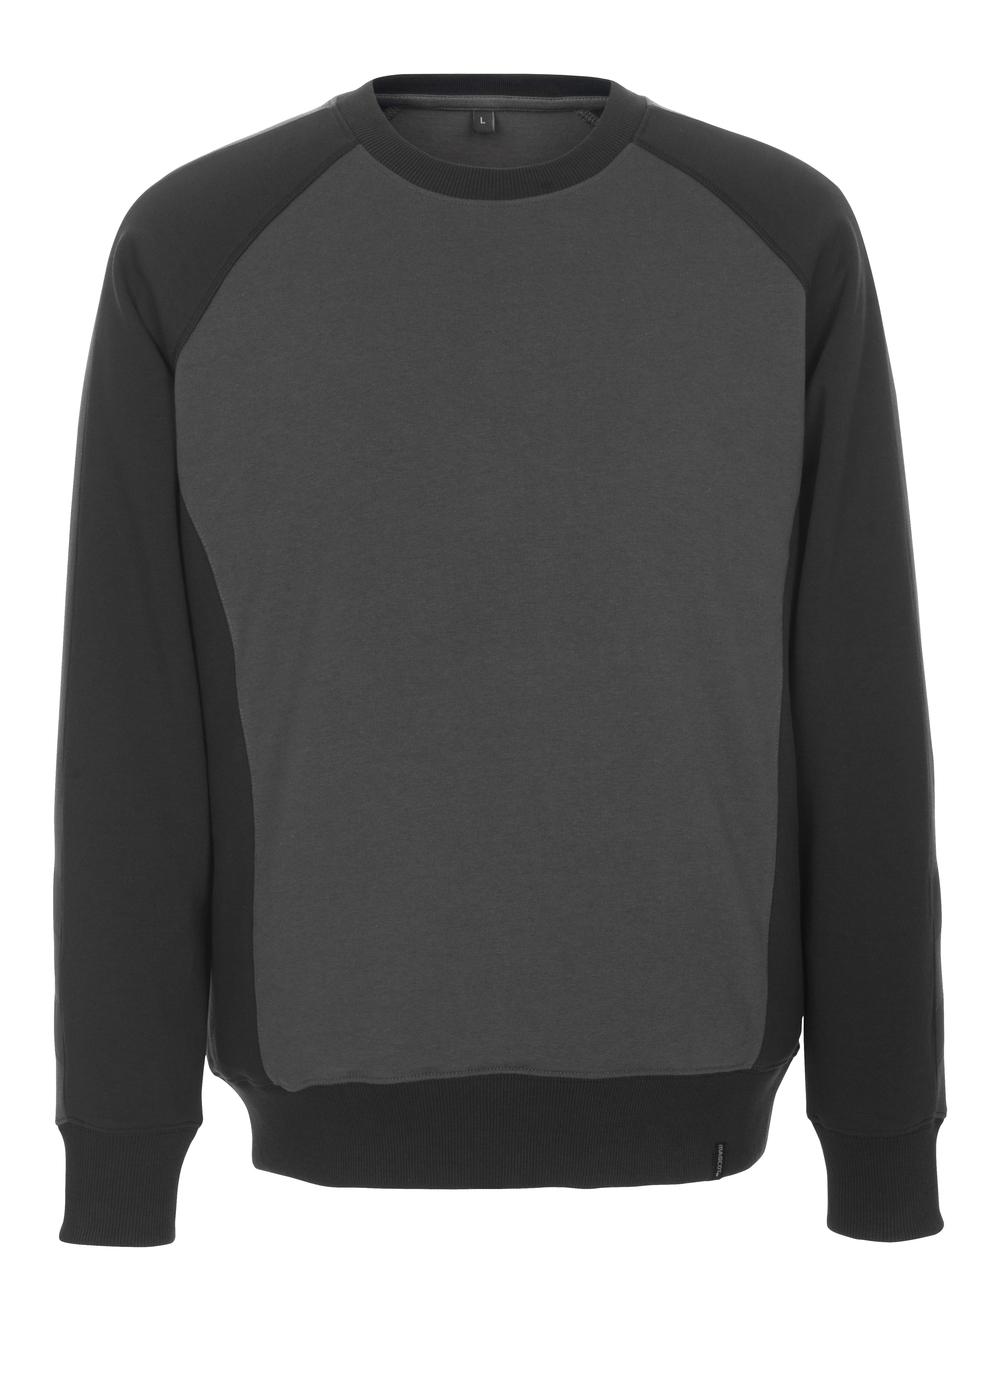 50503-830-1809 Sweatshirt - Dunkelanthrazit/Schwarz